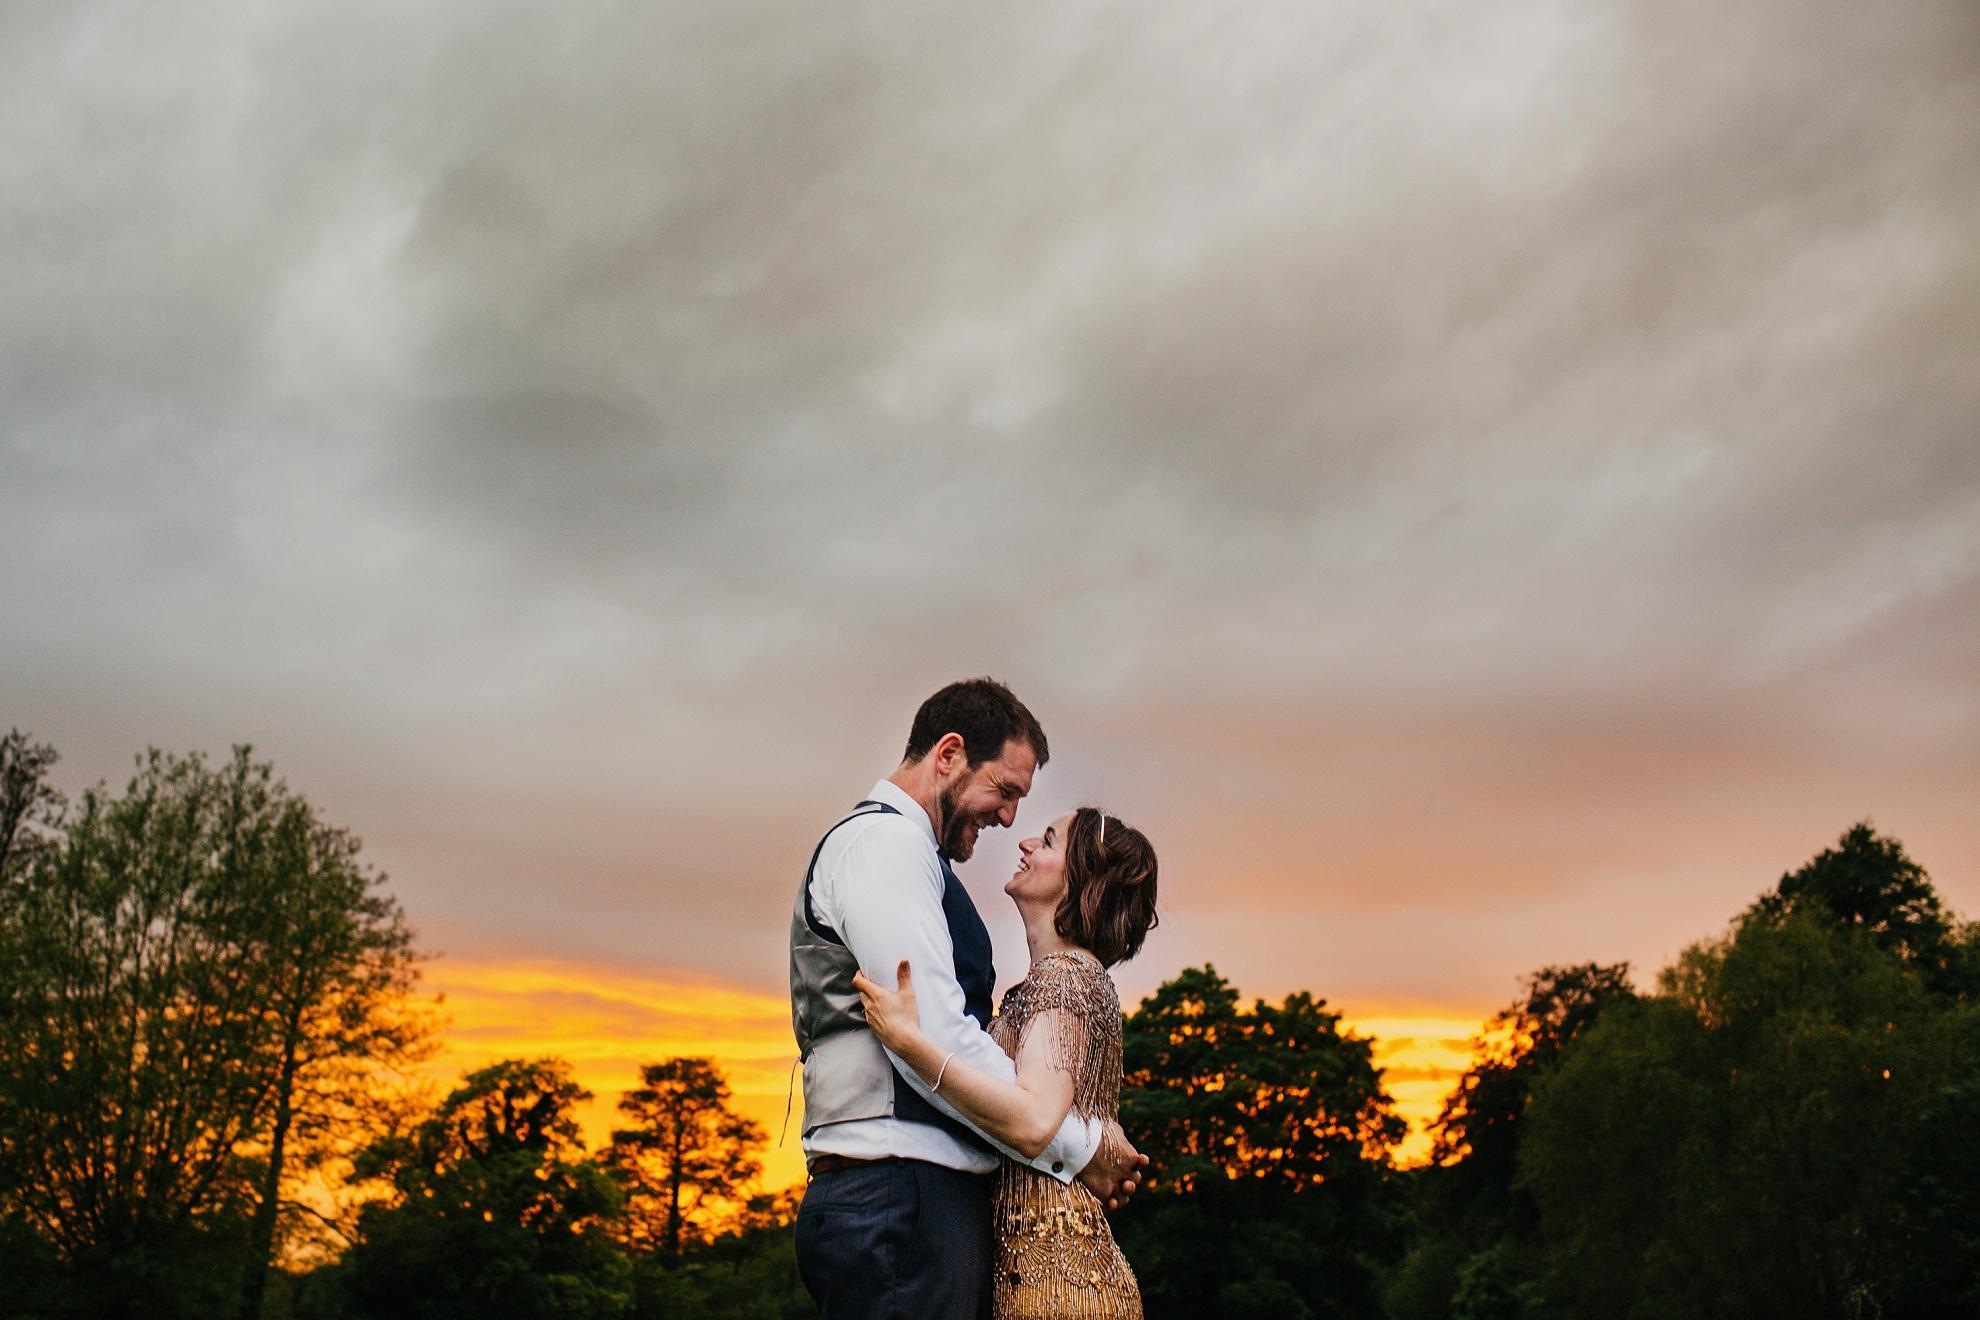 Stowford Manor Farm weddings